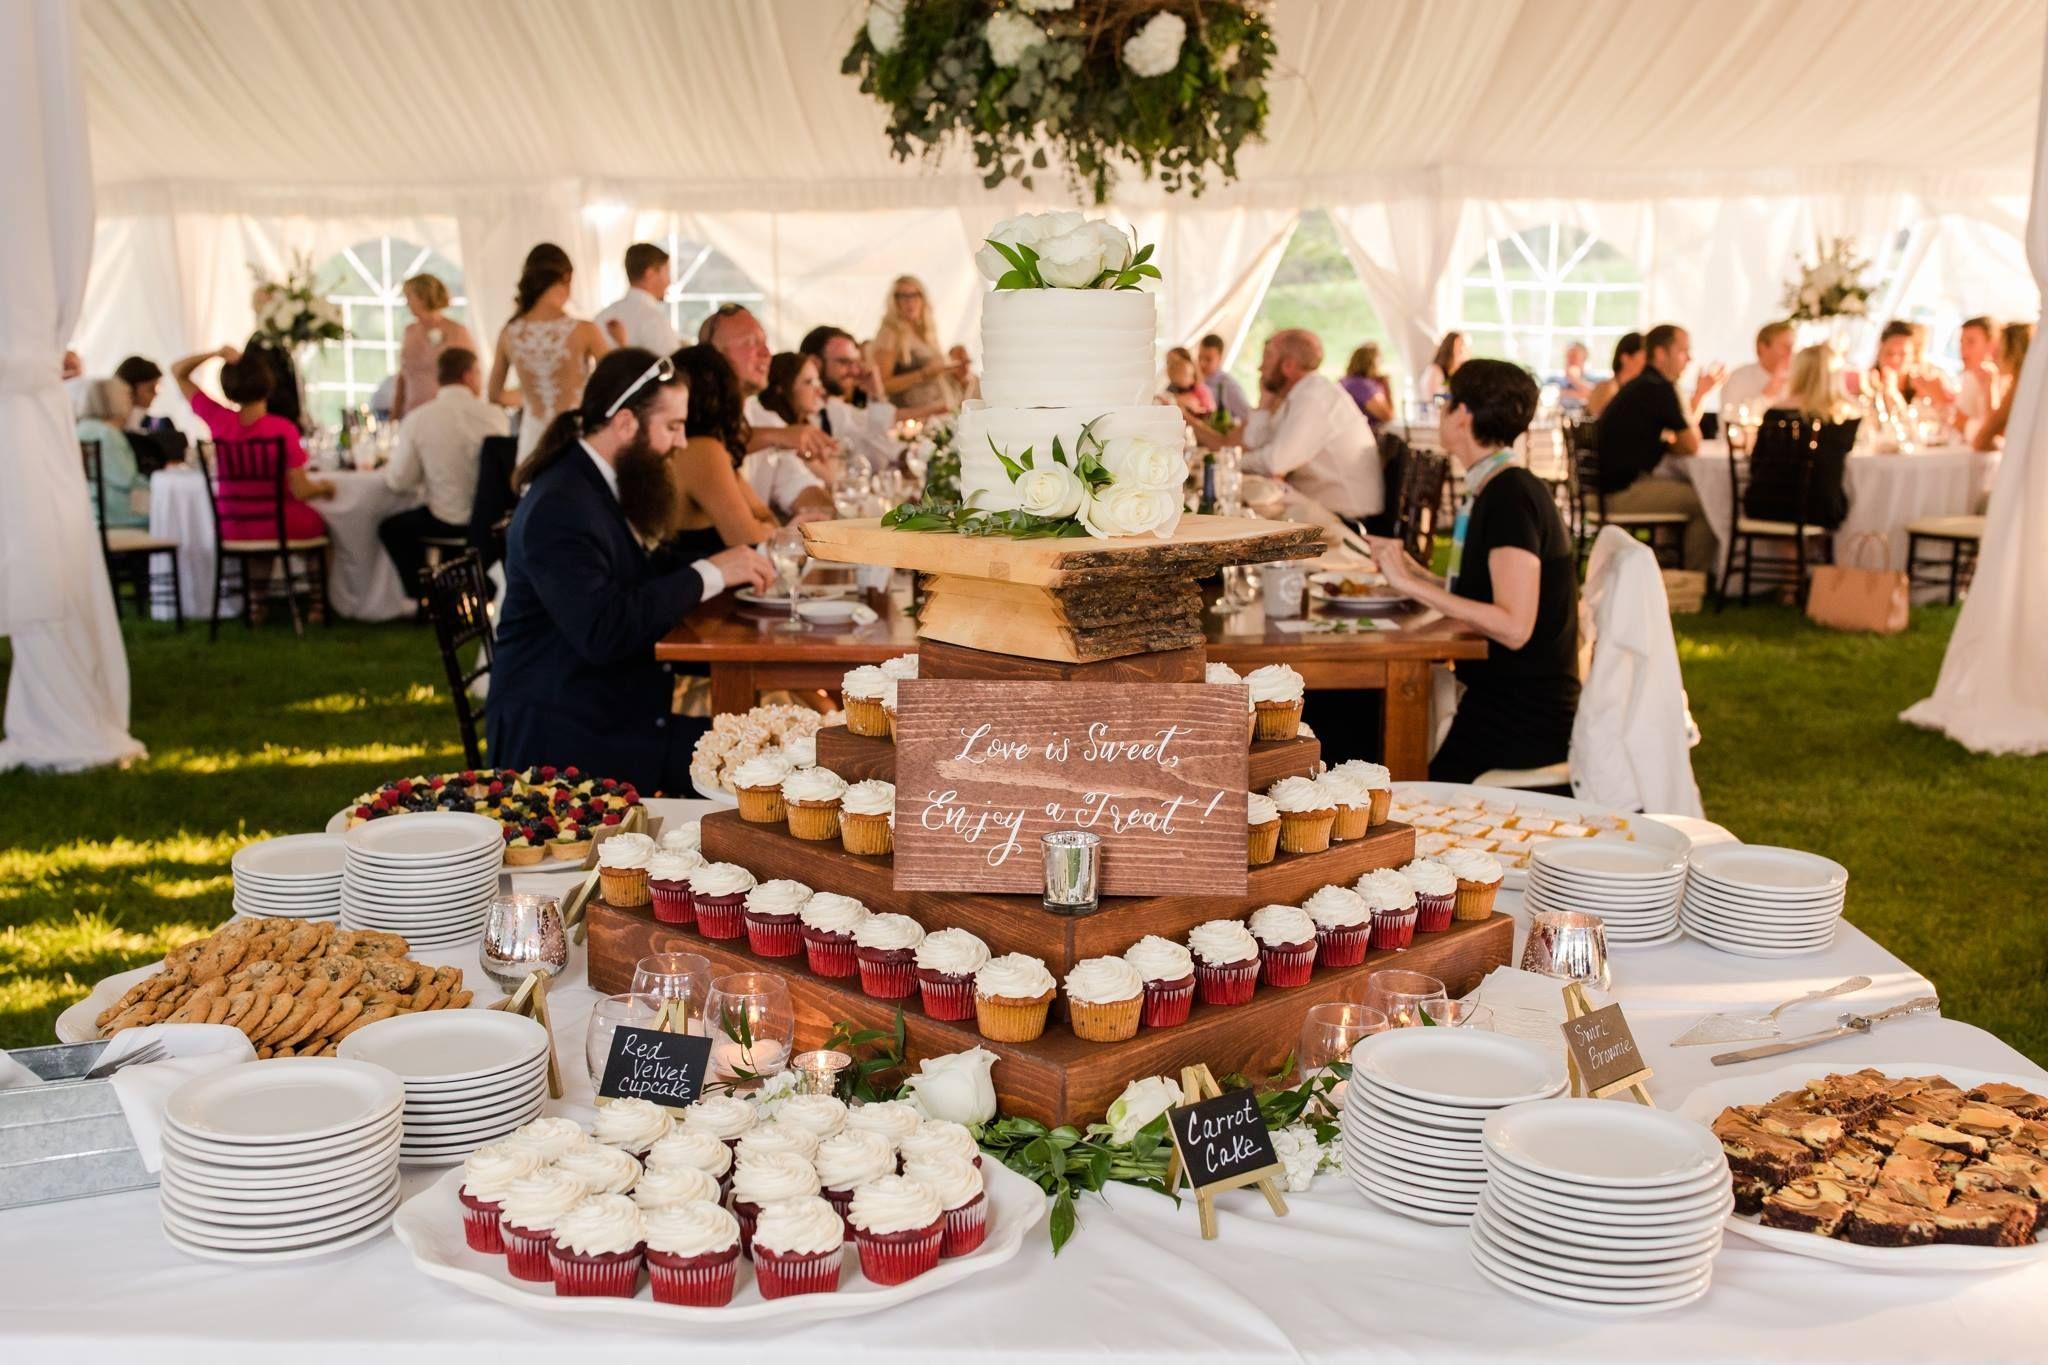 Dessert Table at the Barn @ Five Lakes Resort #BarnWedding